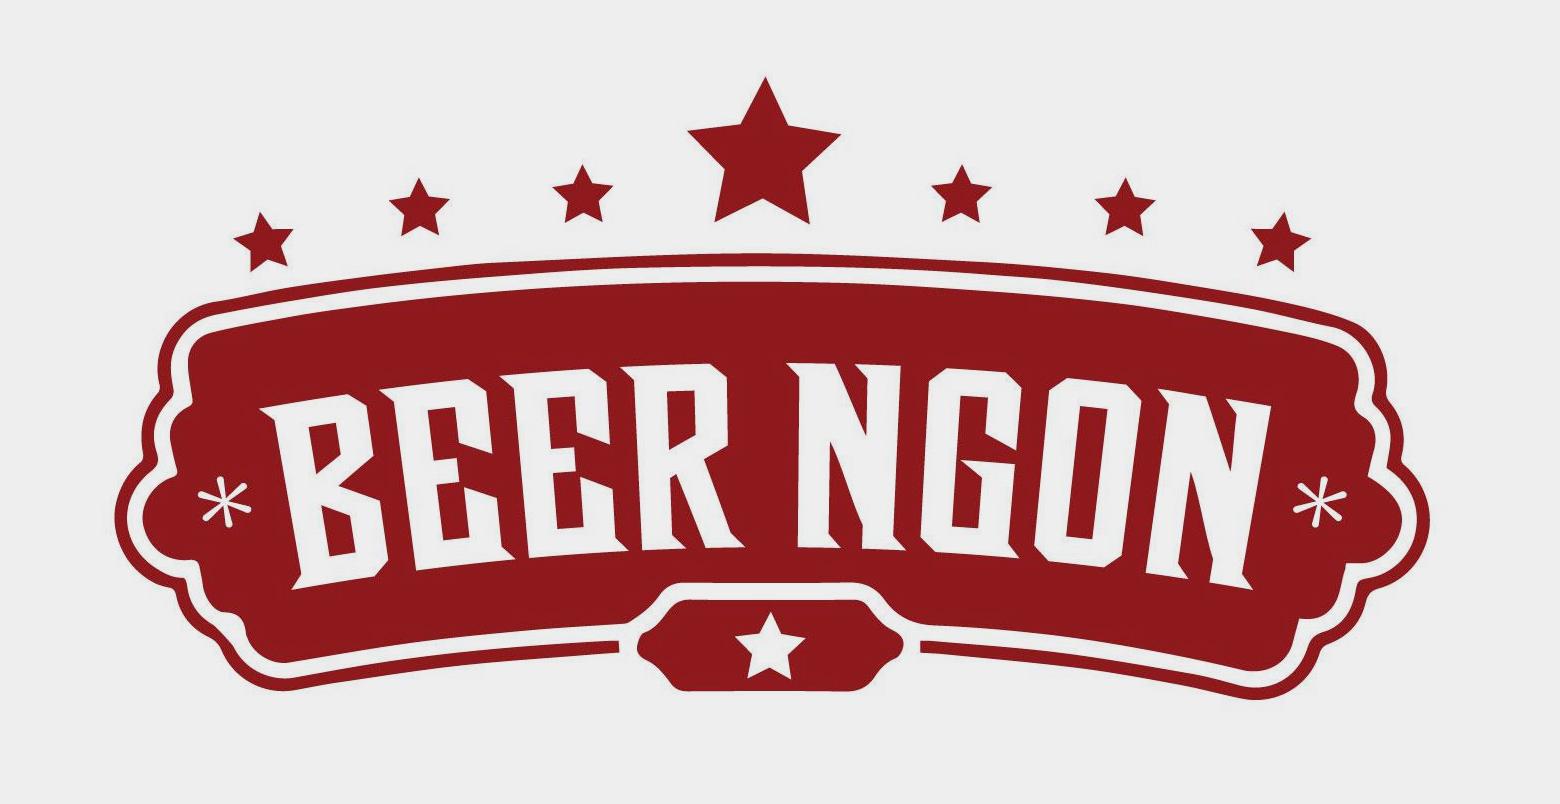 beer ngon